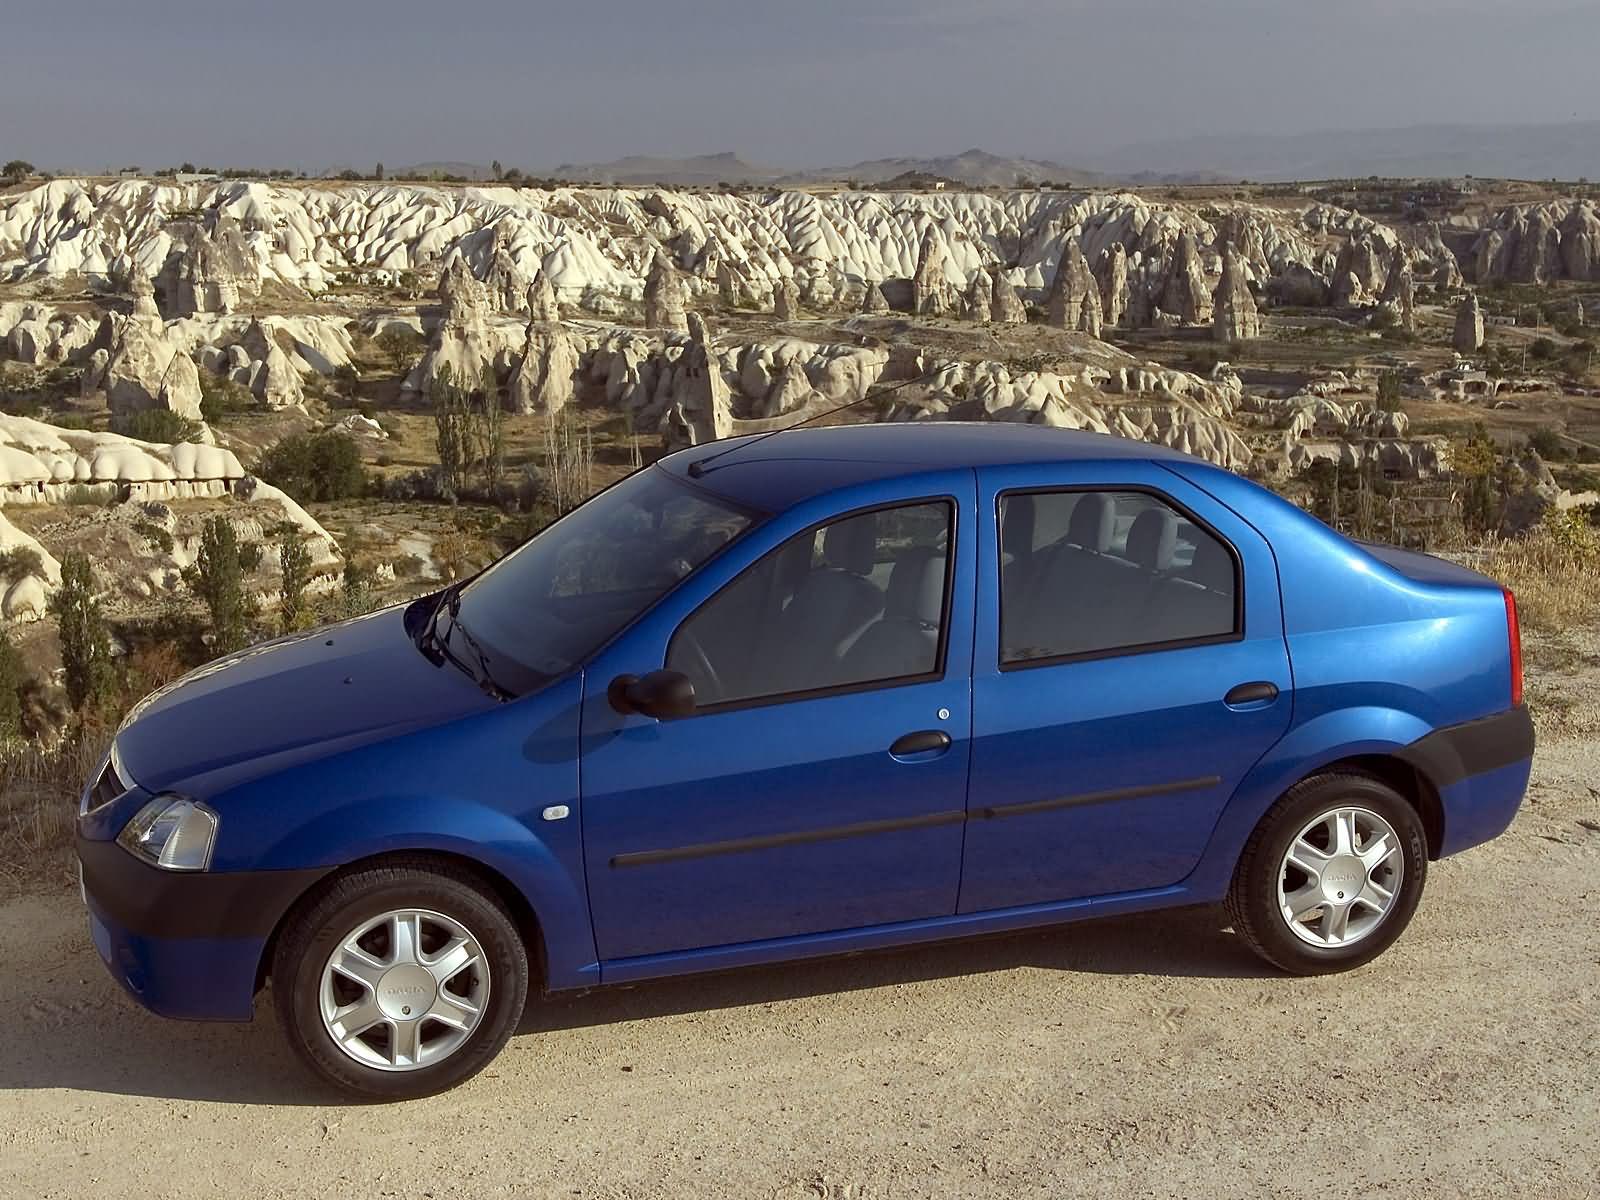 Dacia Logan 2004 carsbase com Dacia-Logan_1_4_MPI_mp60_pic_15542